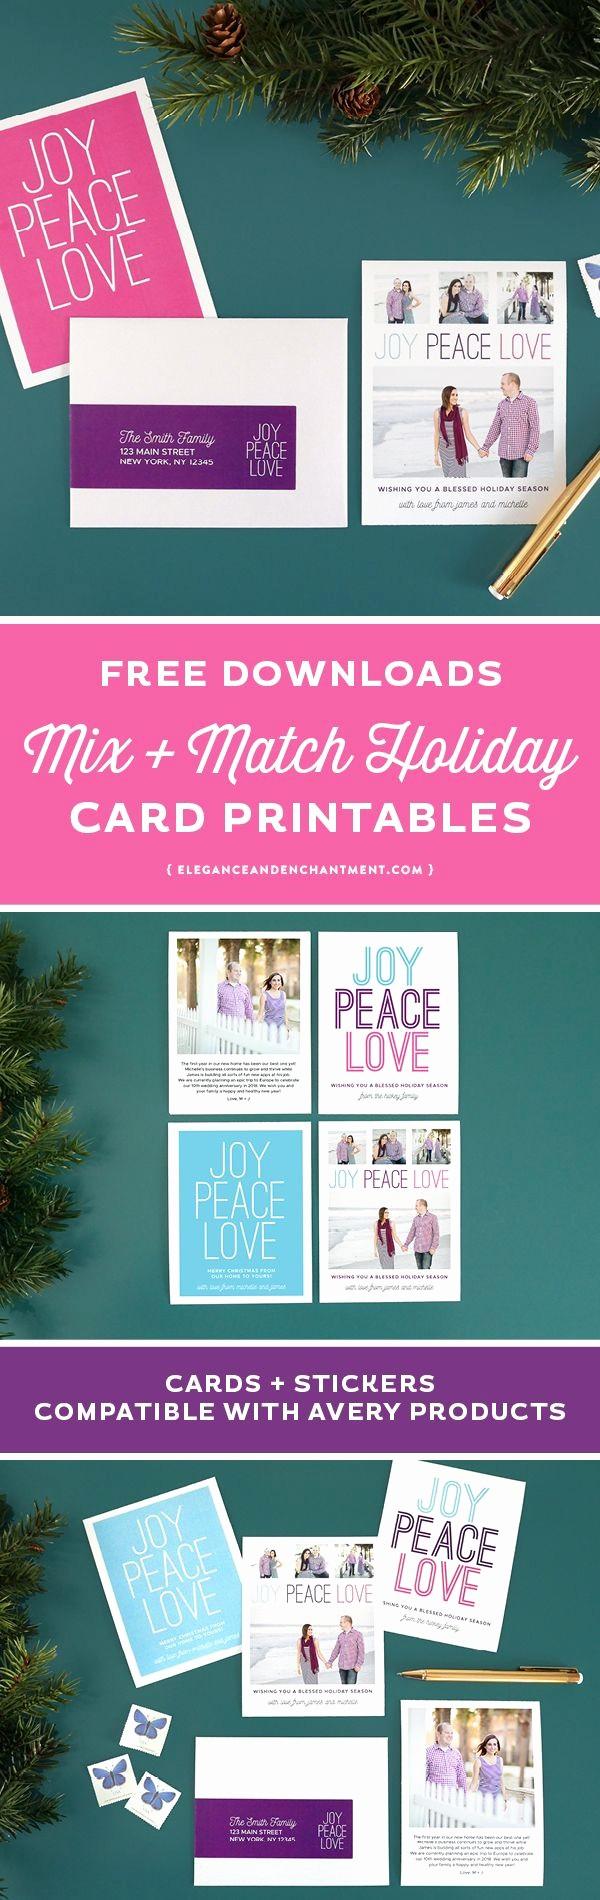 Avery 8160 Christmas Gift Labels Unique 25 Unique Free Address Labels Ideas On Pinterest